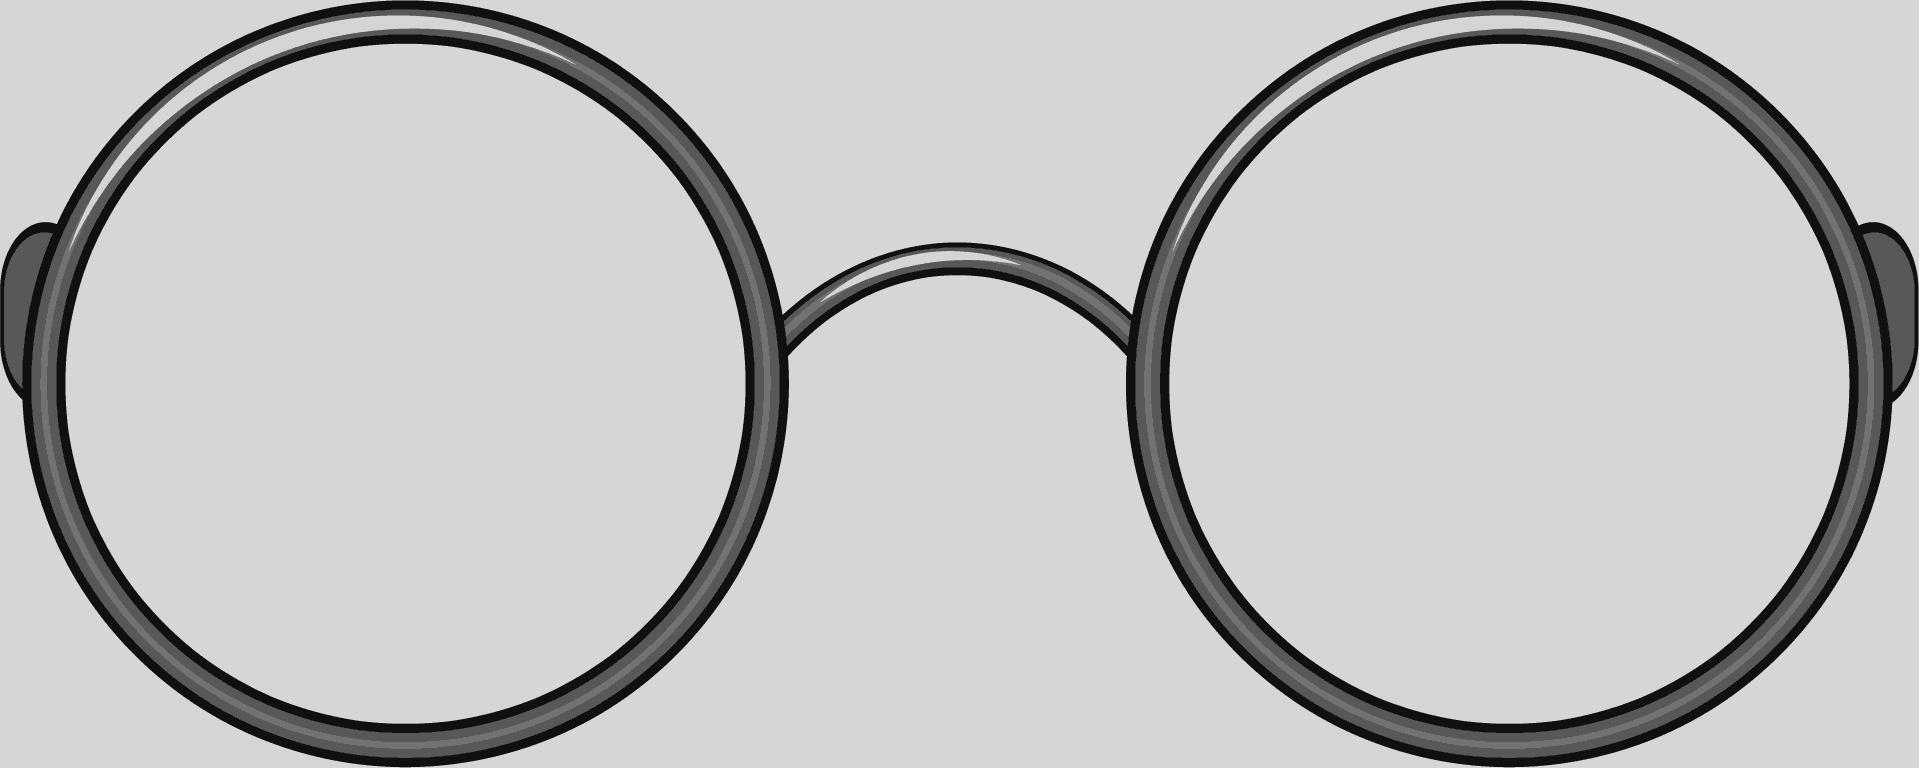 Glass clipart eyeglasses. Glasses png